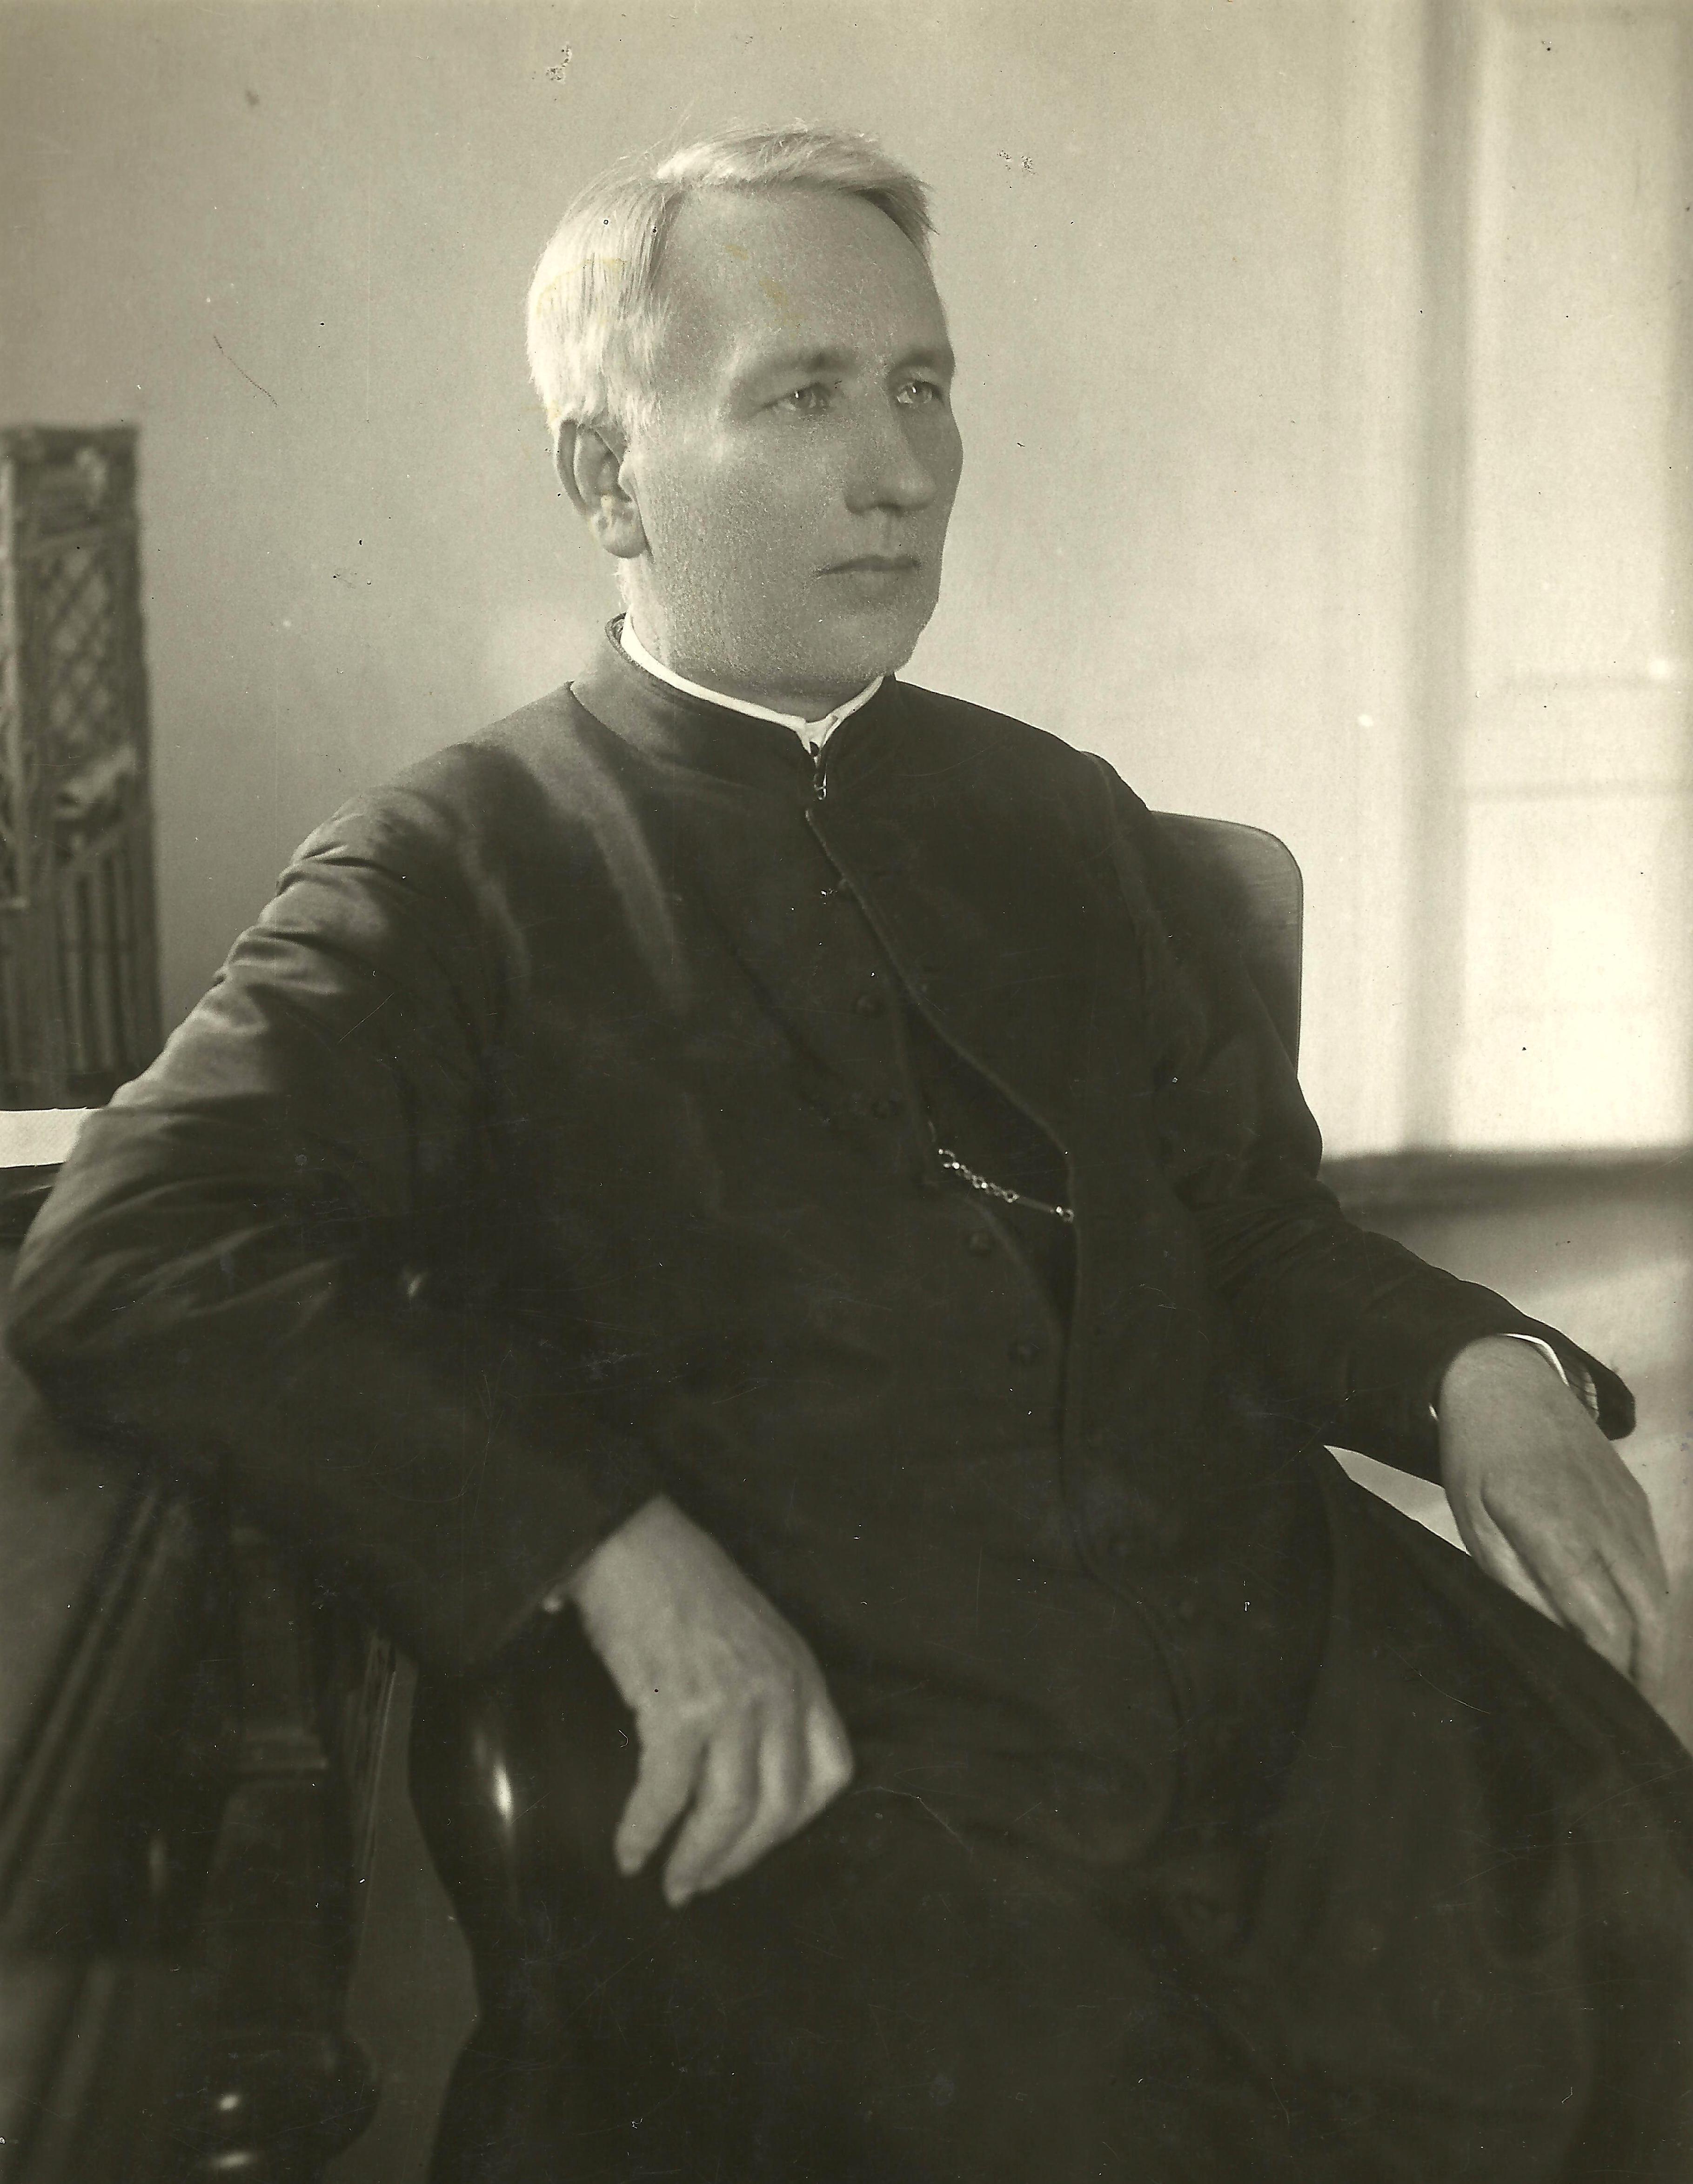 Ks. Otton Sidorowicz